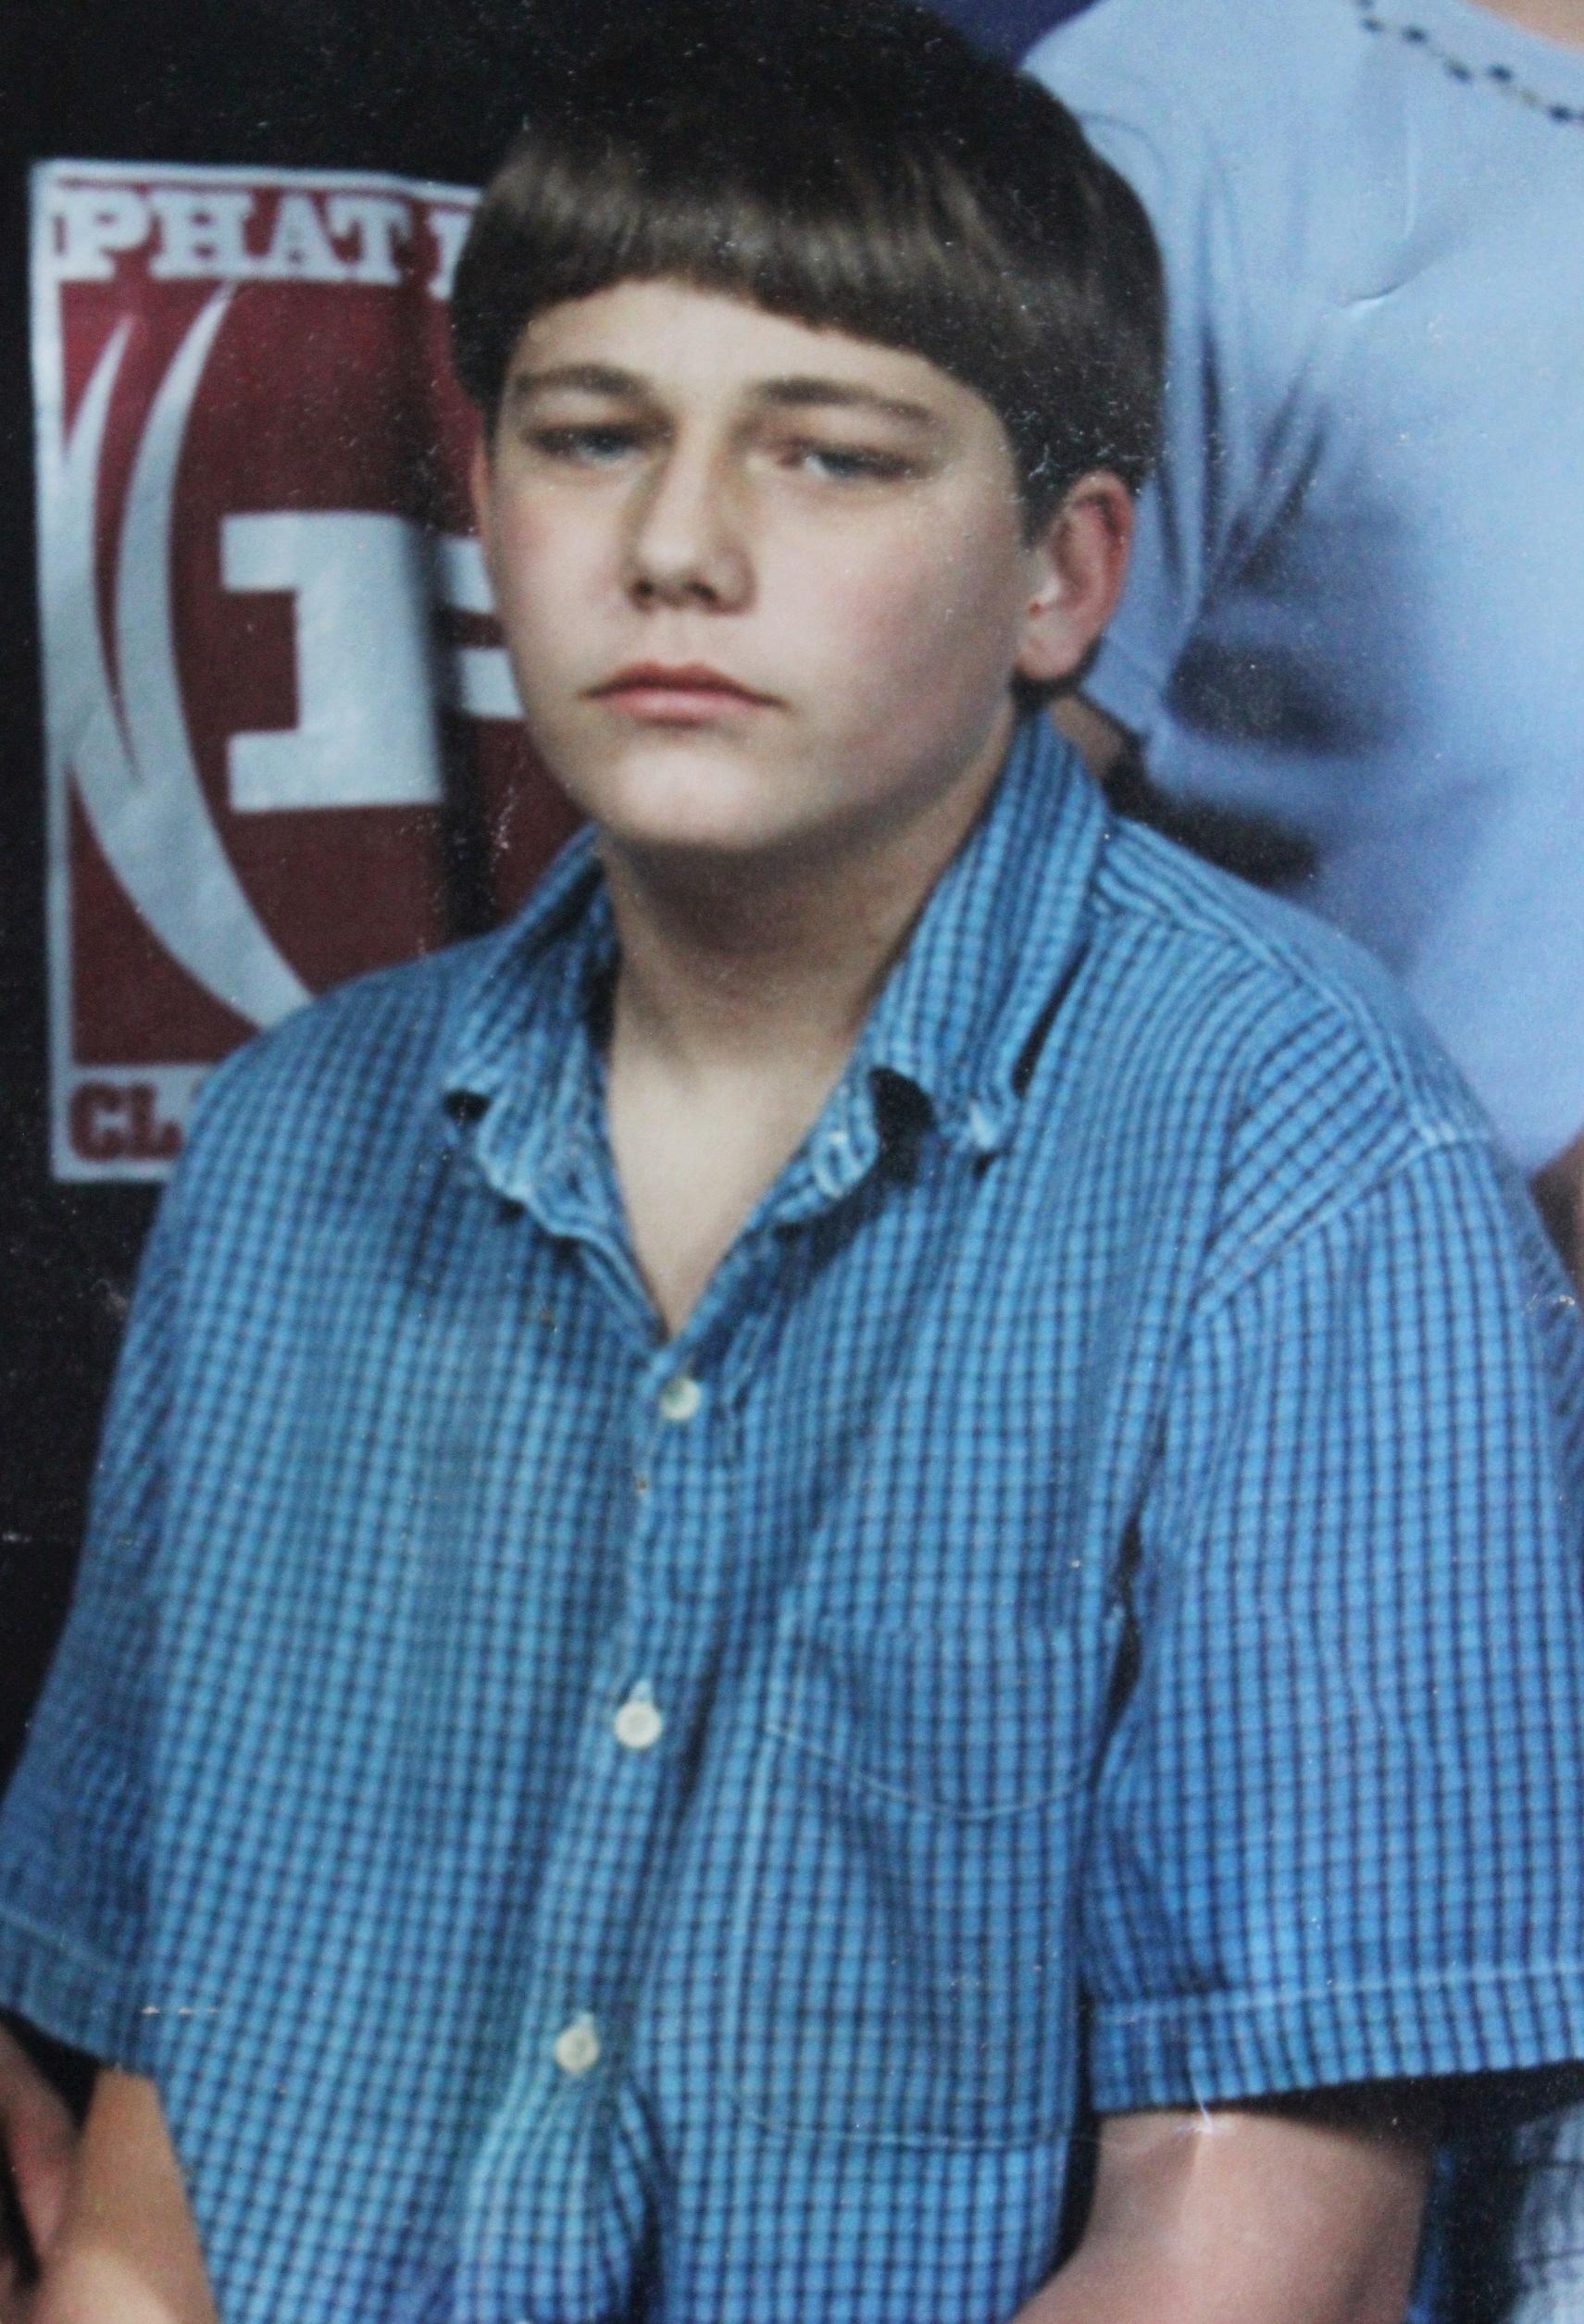 josh 13 years old.JPG